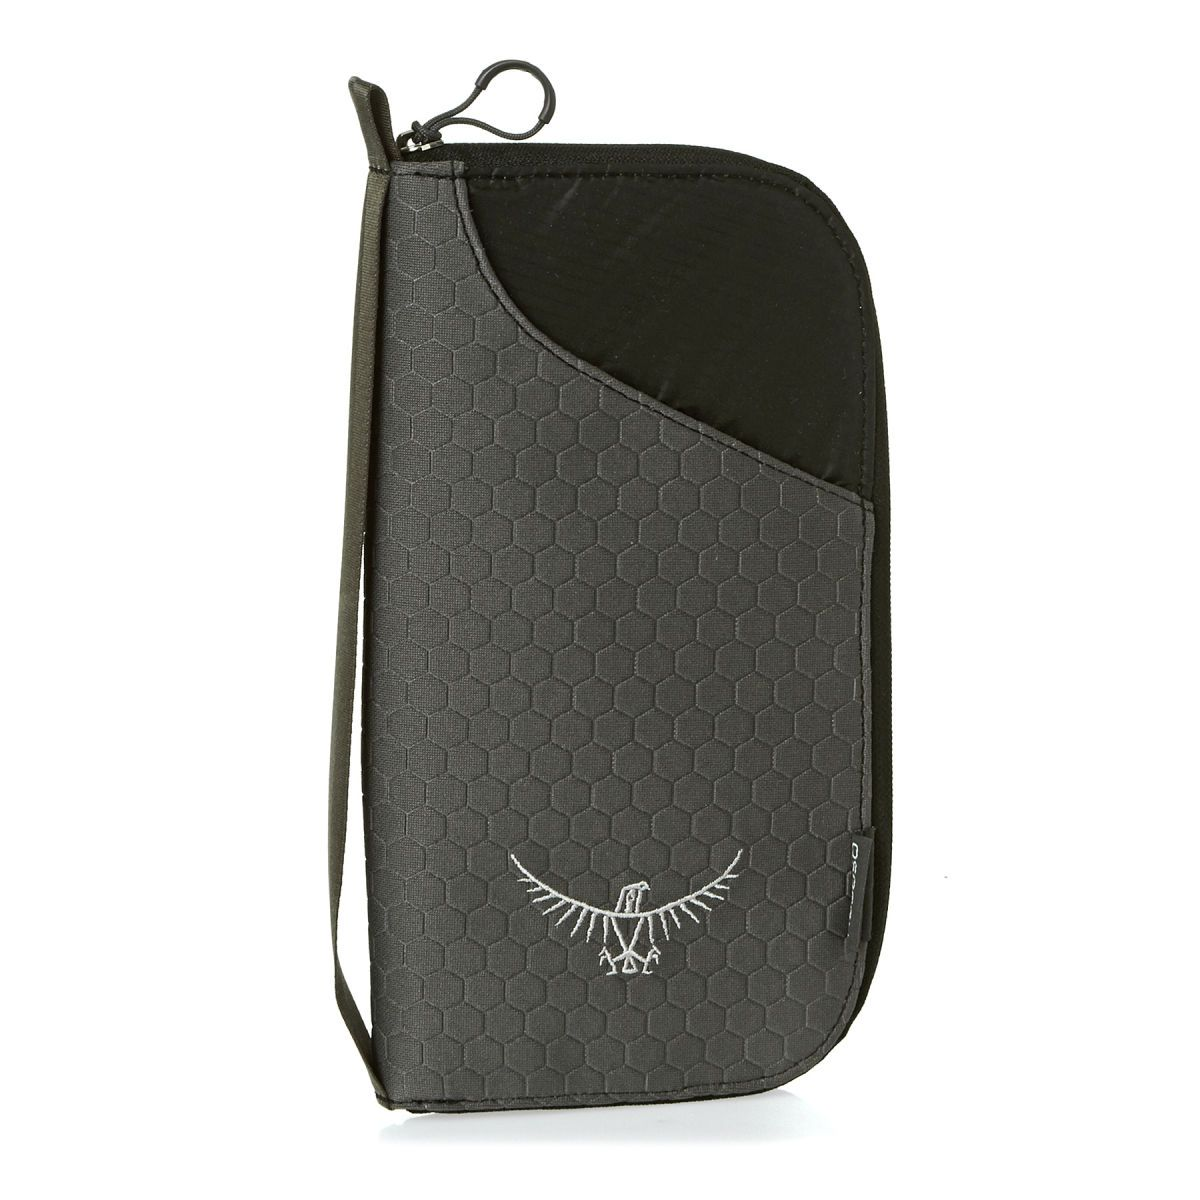 Osprey Travel - Osprey Document Zip Wallet